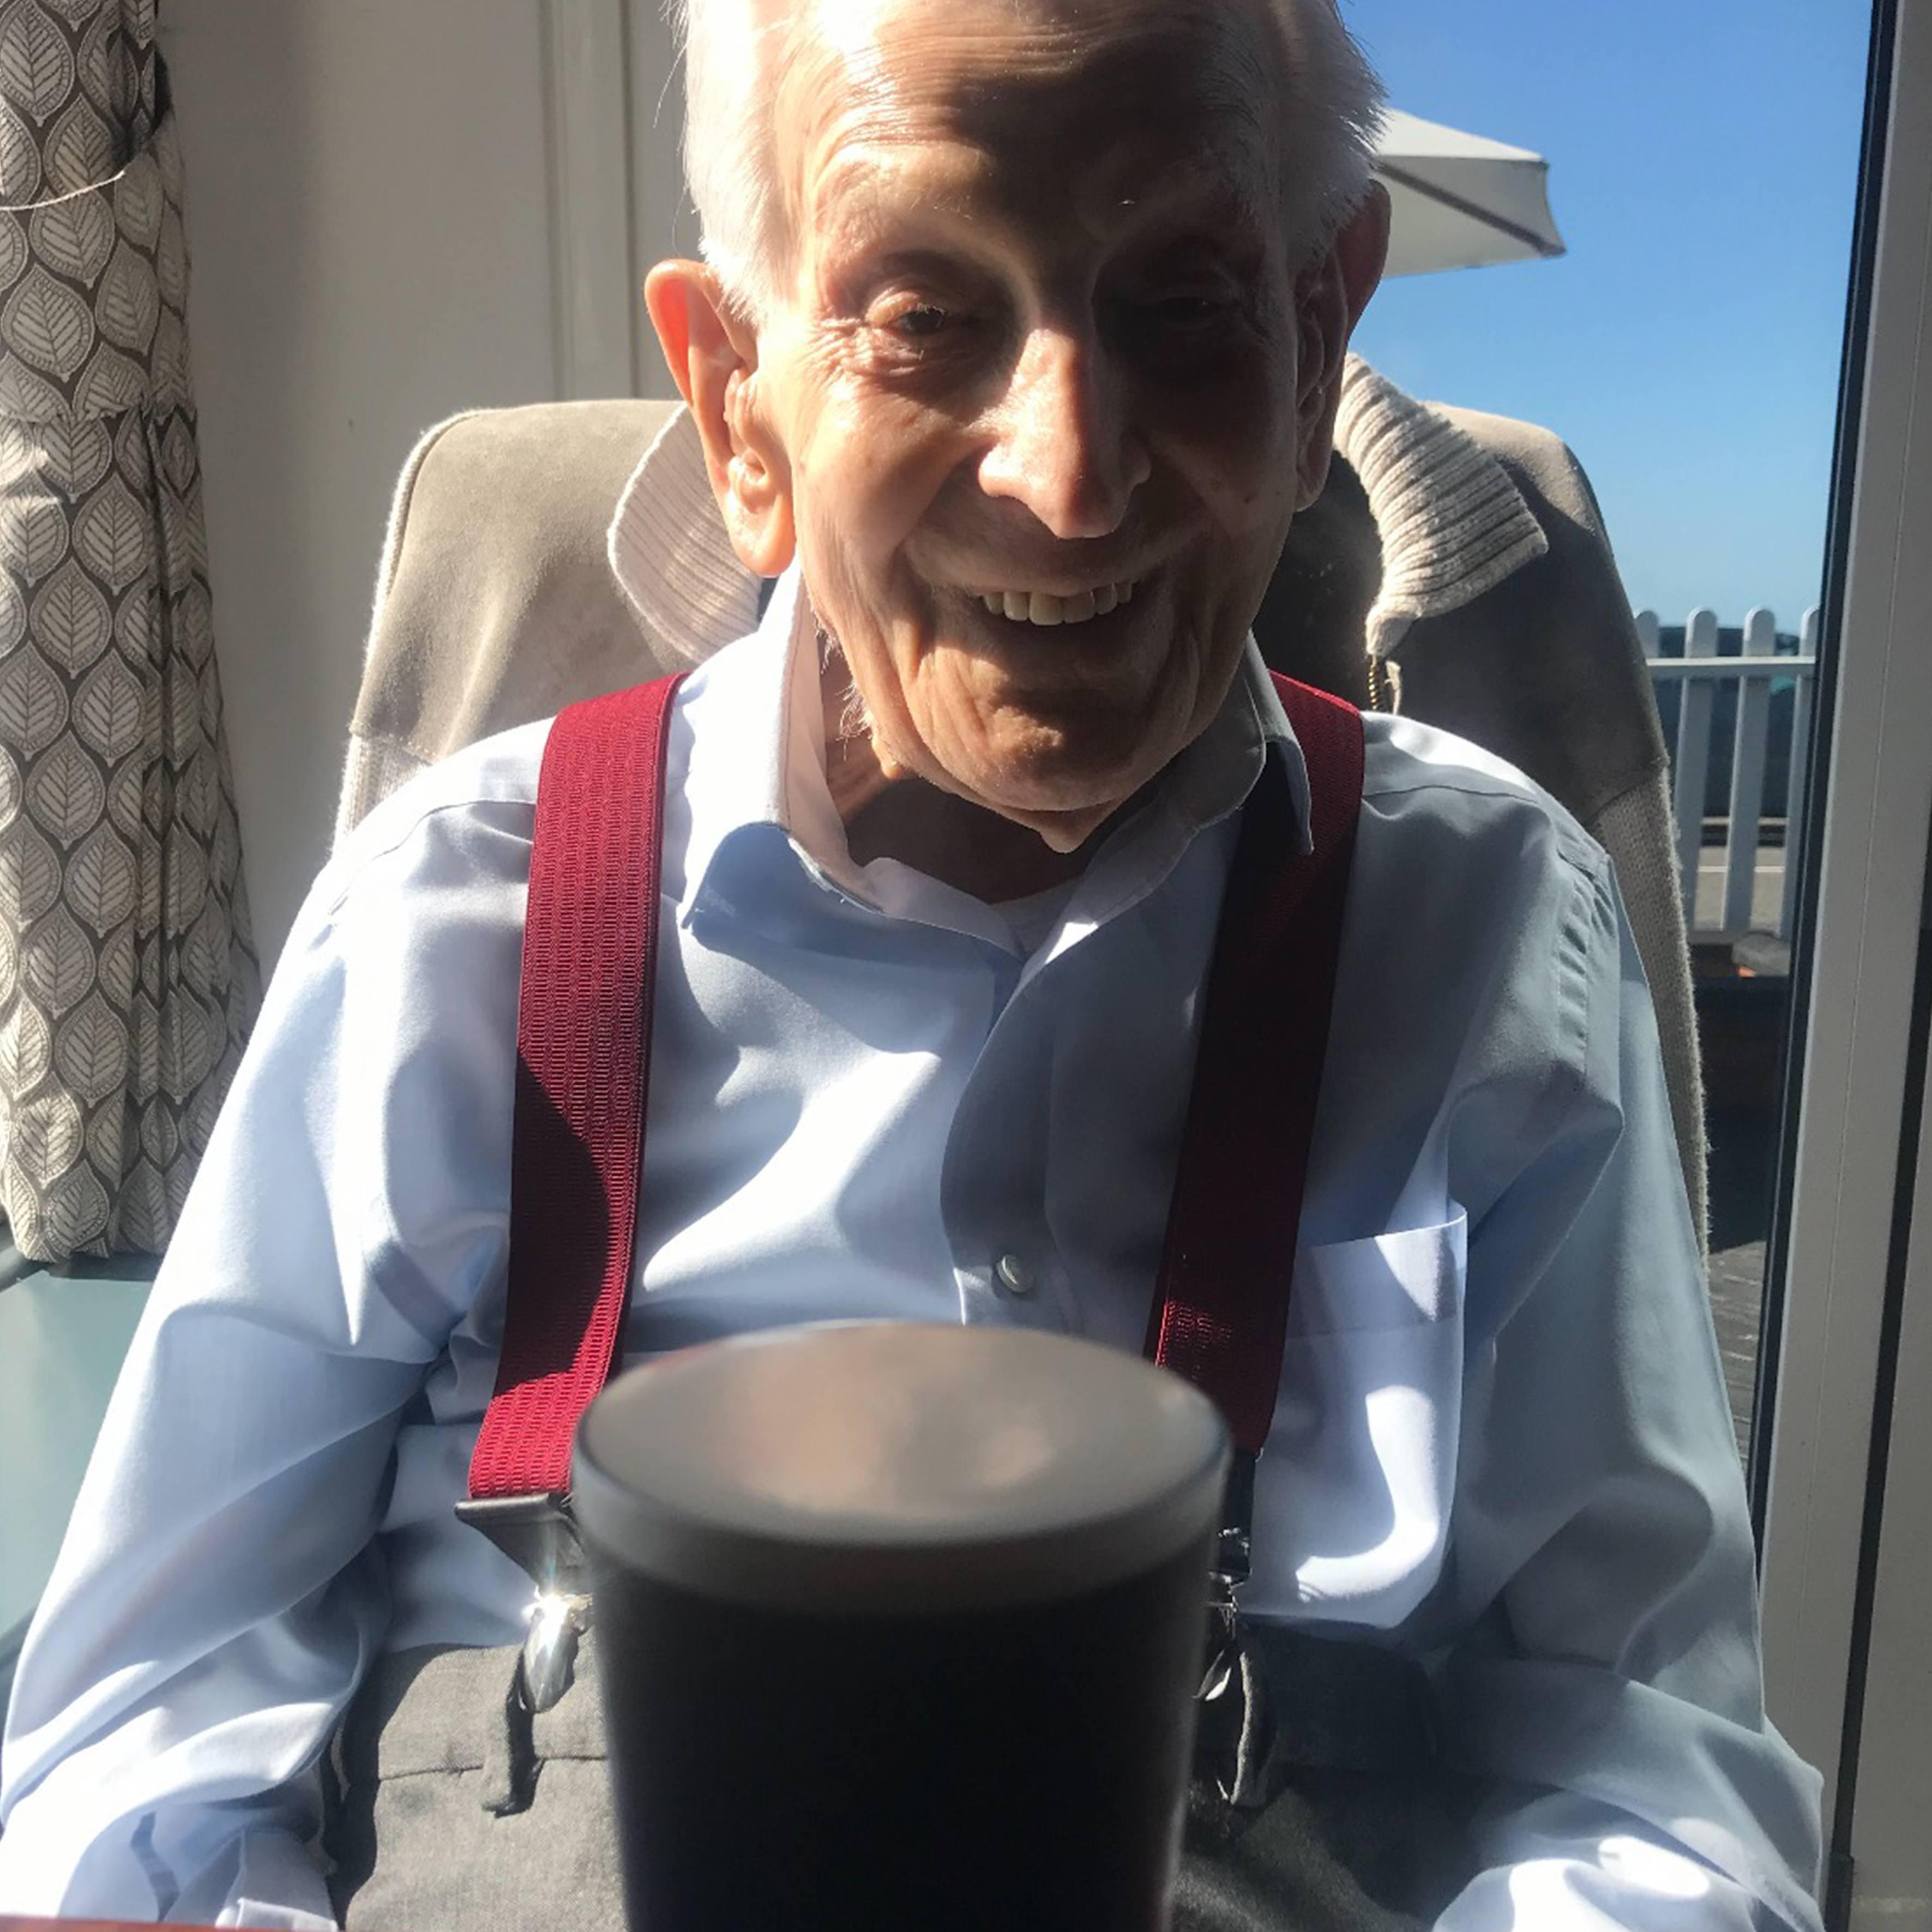 Centenarian Arthur enjoys a pint of beer